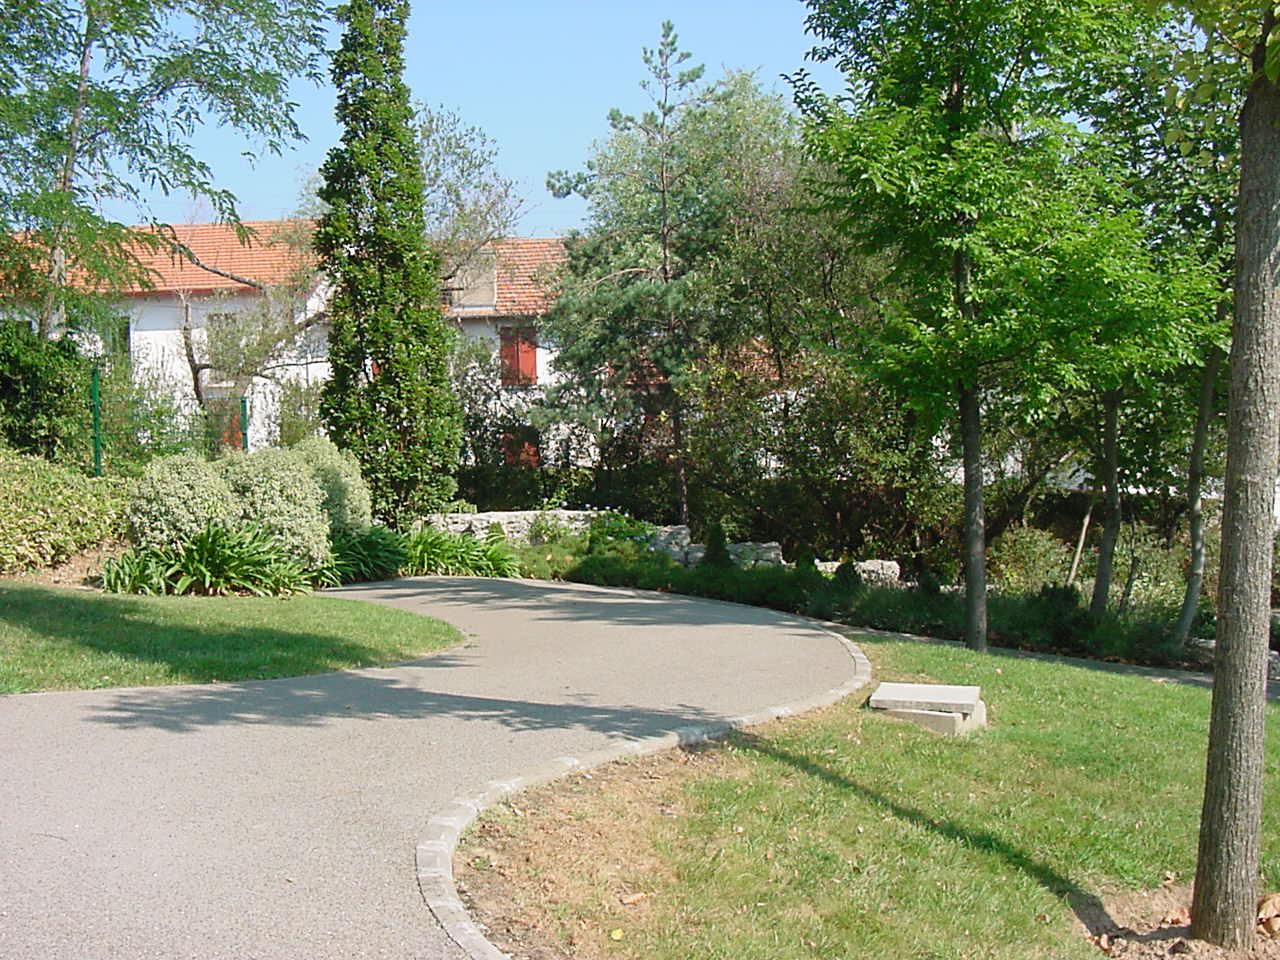 Jardin de ville_Lahouze 05